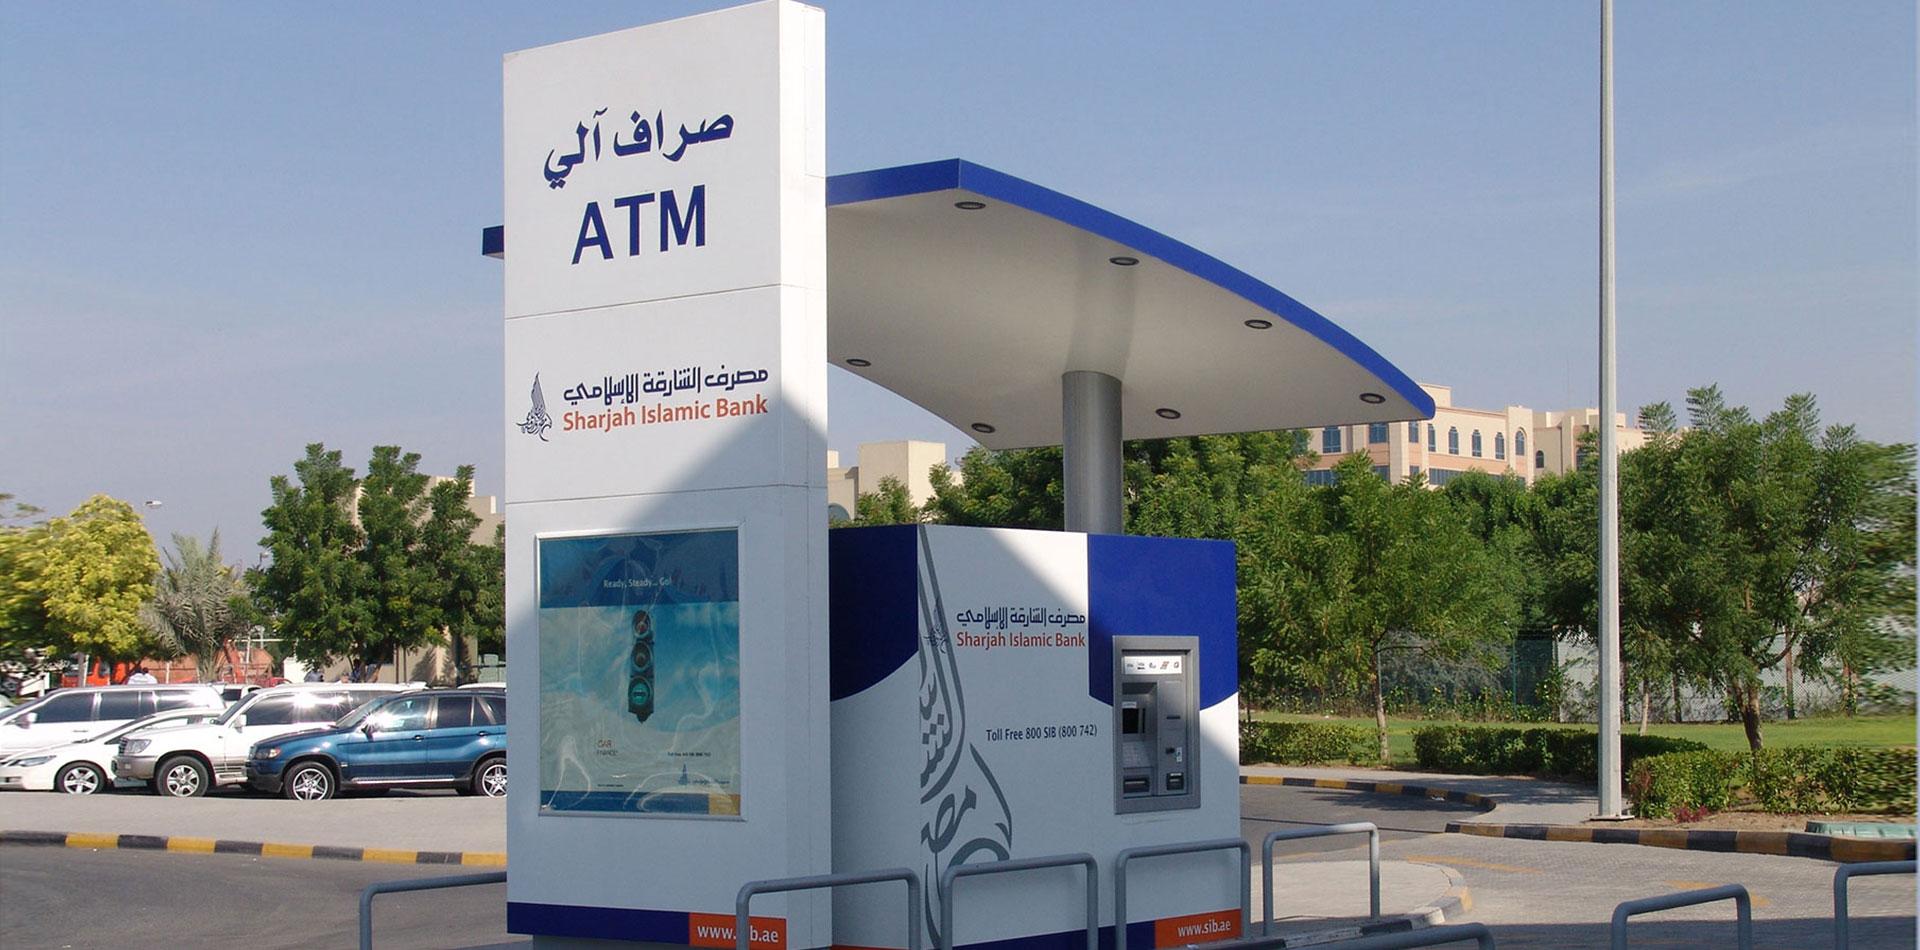 External Freestanding Signage Amp Led Screen For Sharjah